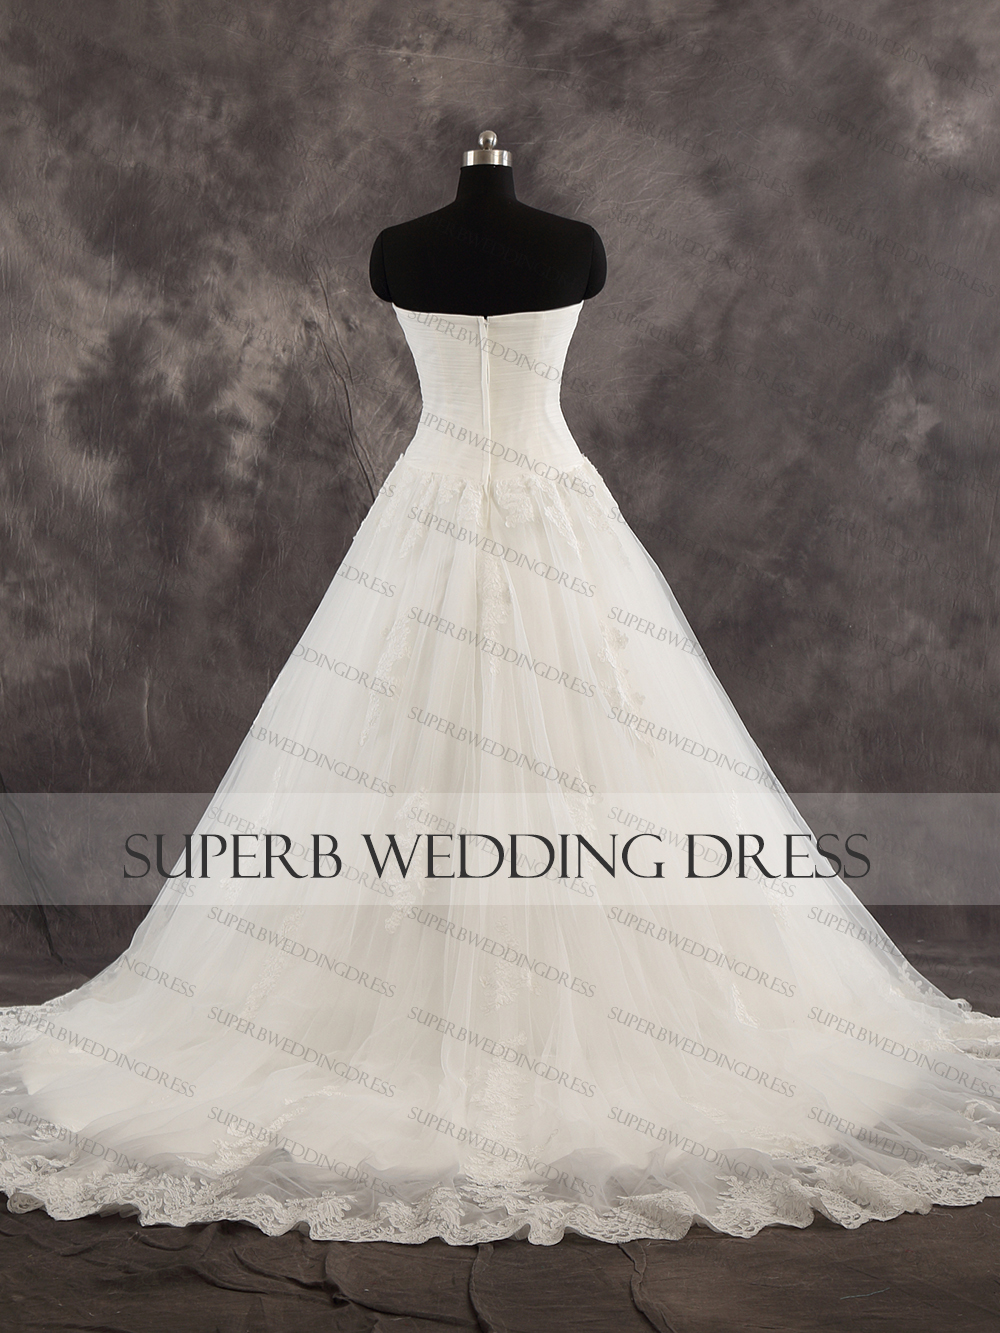 High Quality Wedding Dress Sweetheart Neckline Bridal Gown Dresses For Bride Superbweddingdress in Wedding Dresses from Weddings Events